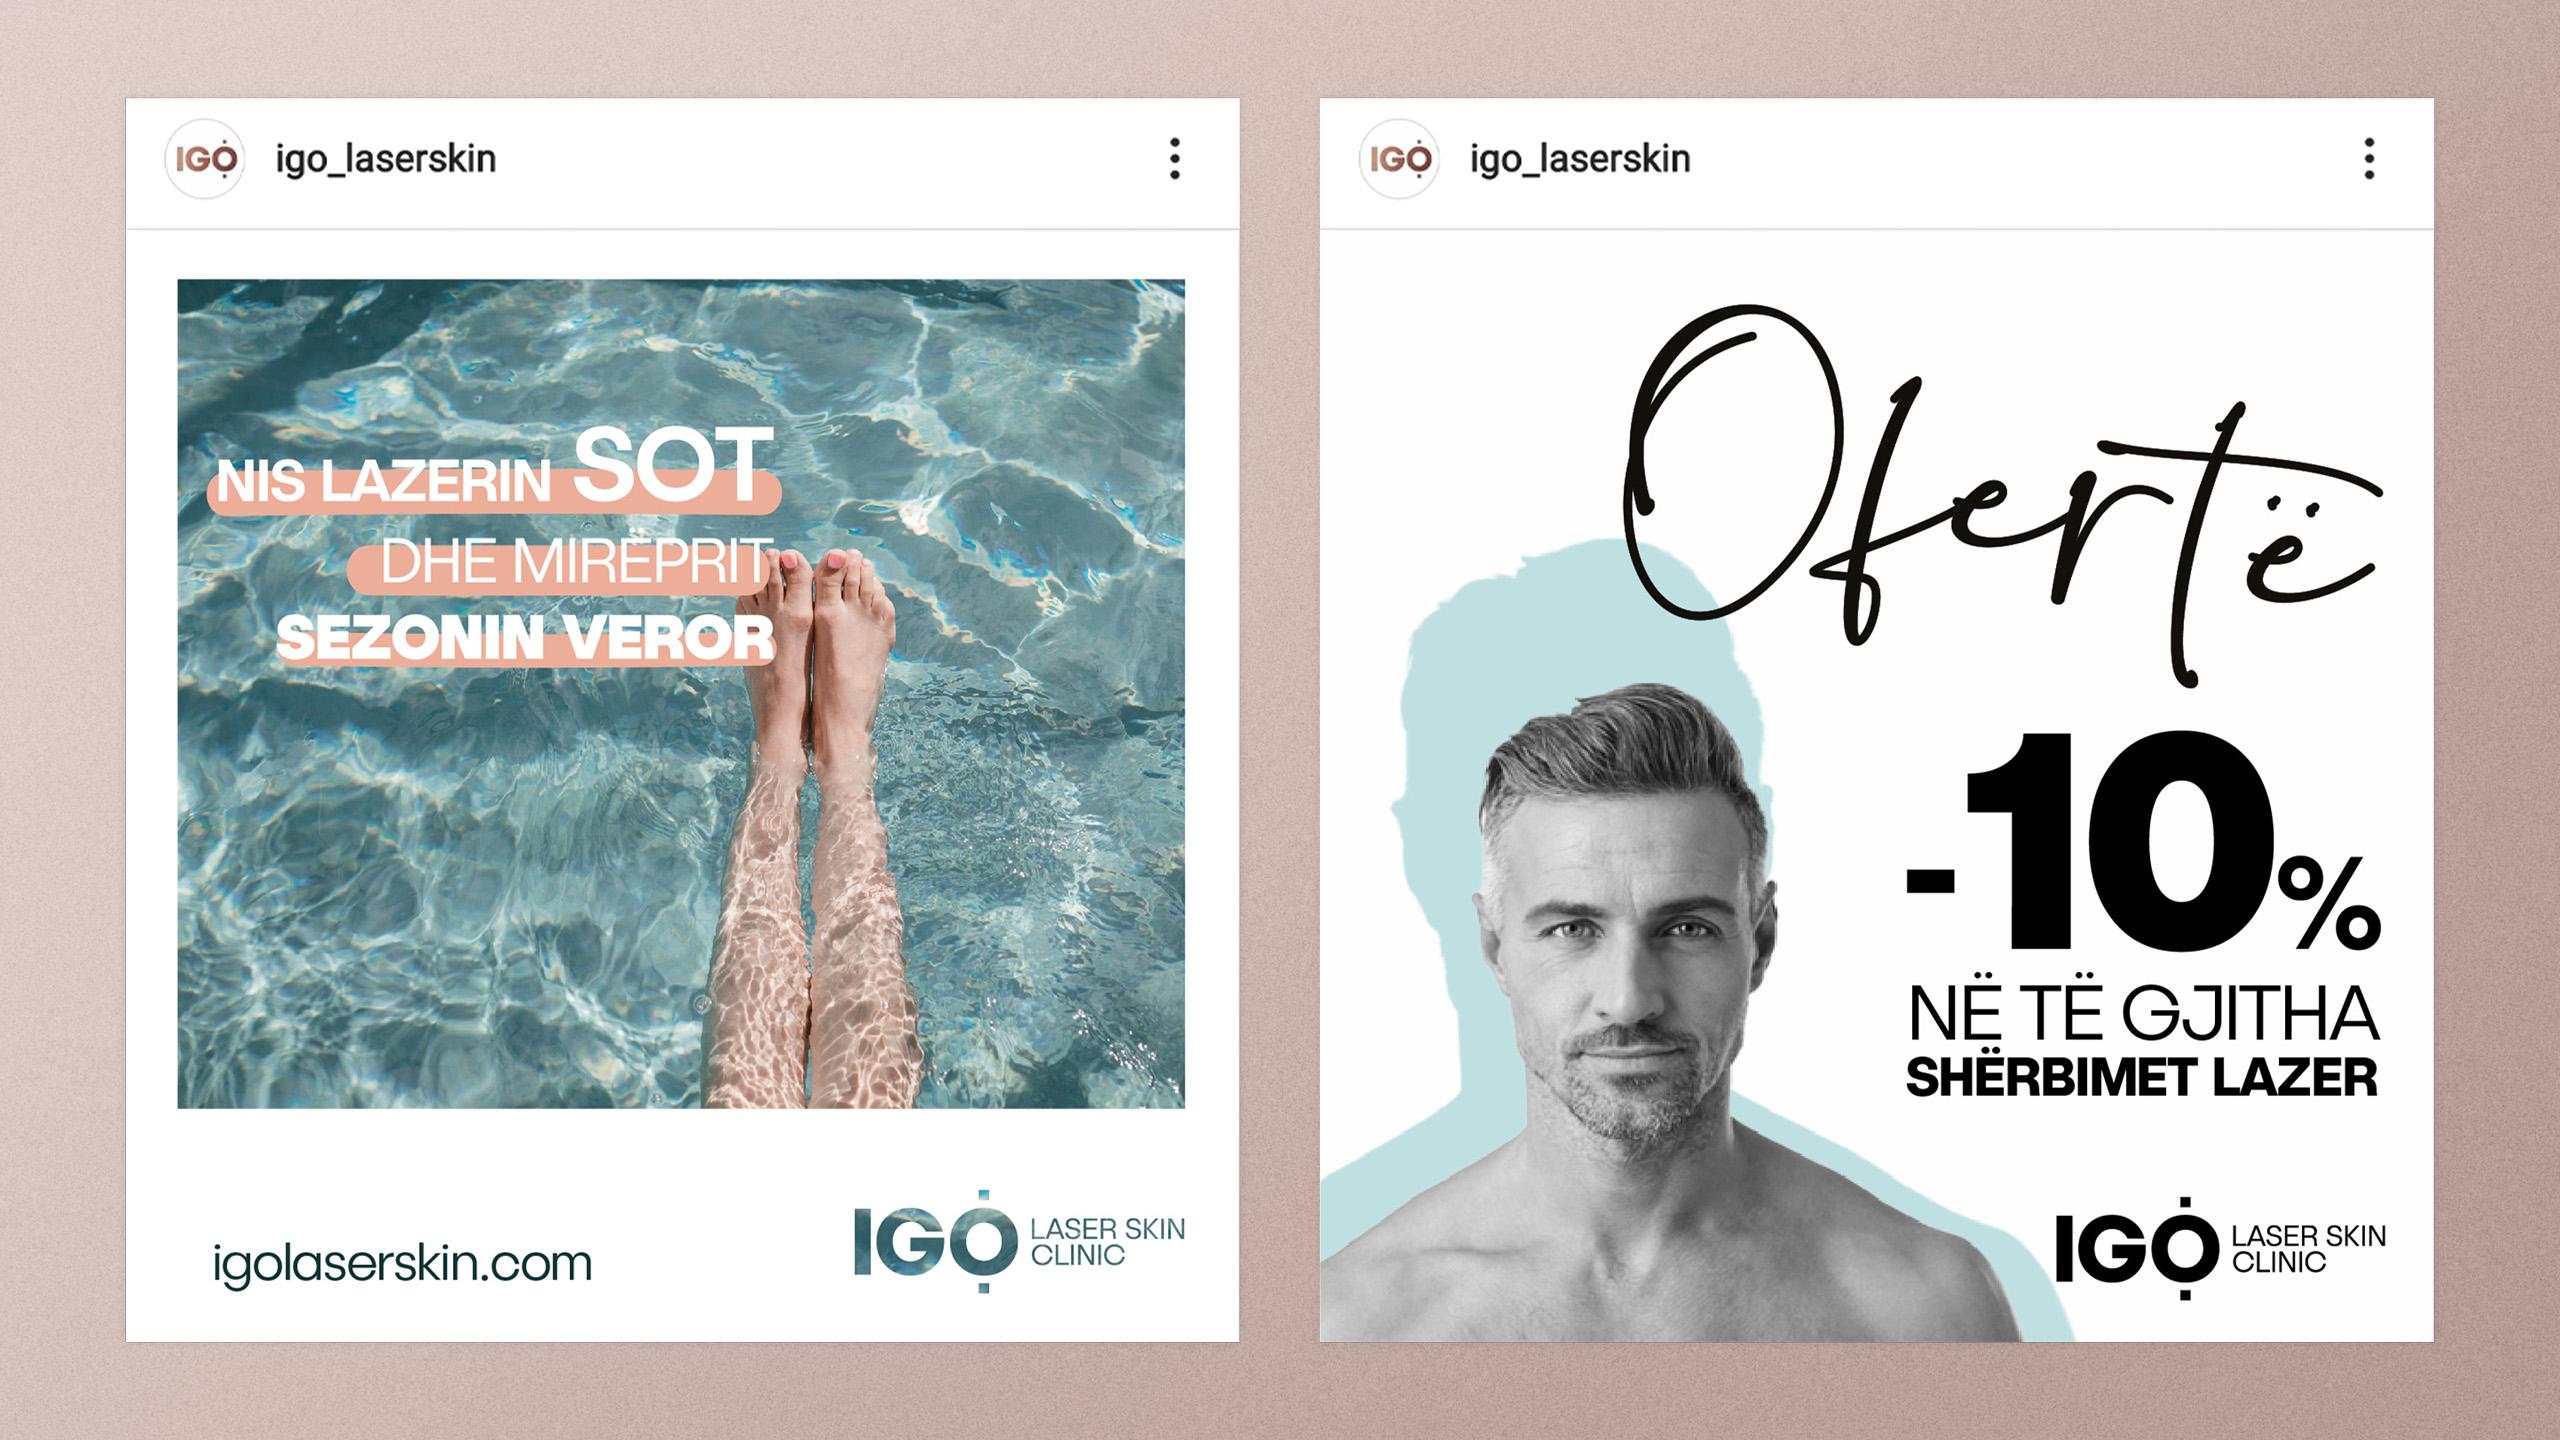 IGO Laser Skin Project Img 3 - Vatra Agency / Founder & CEO Gerton Bejo